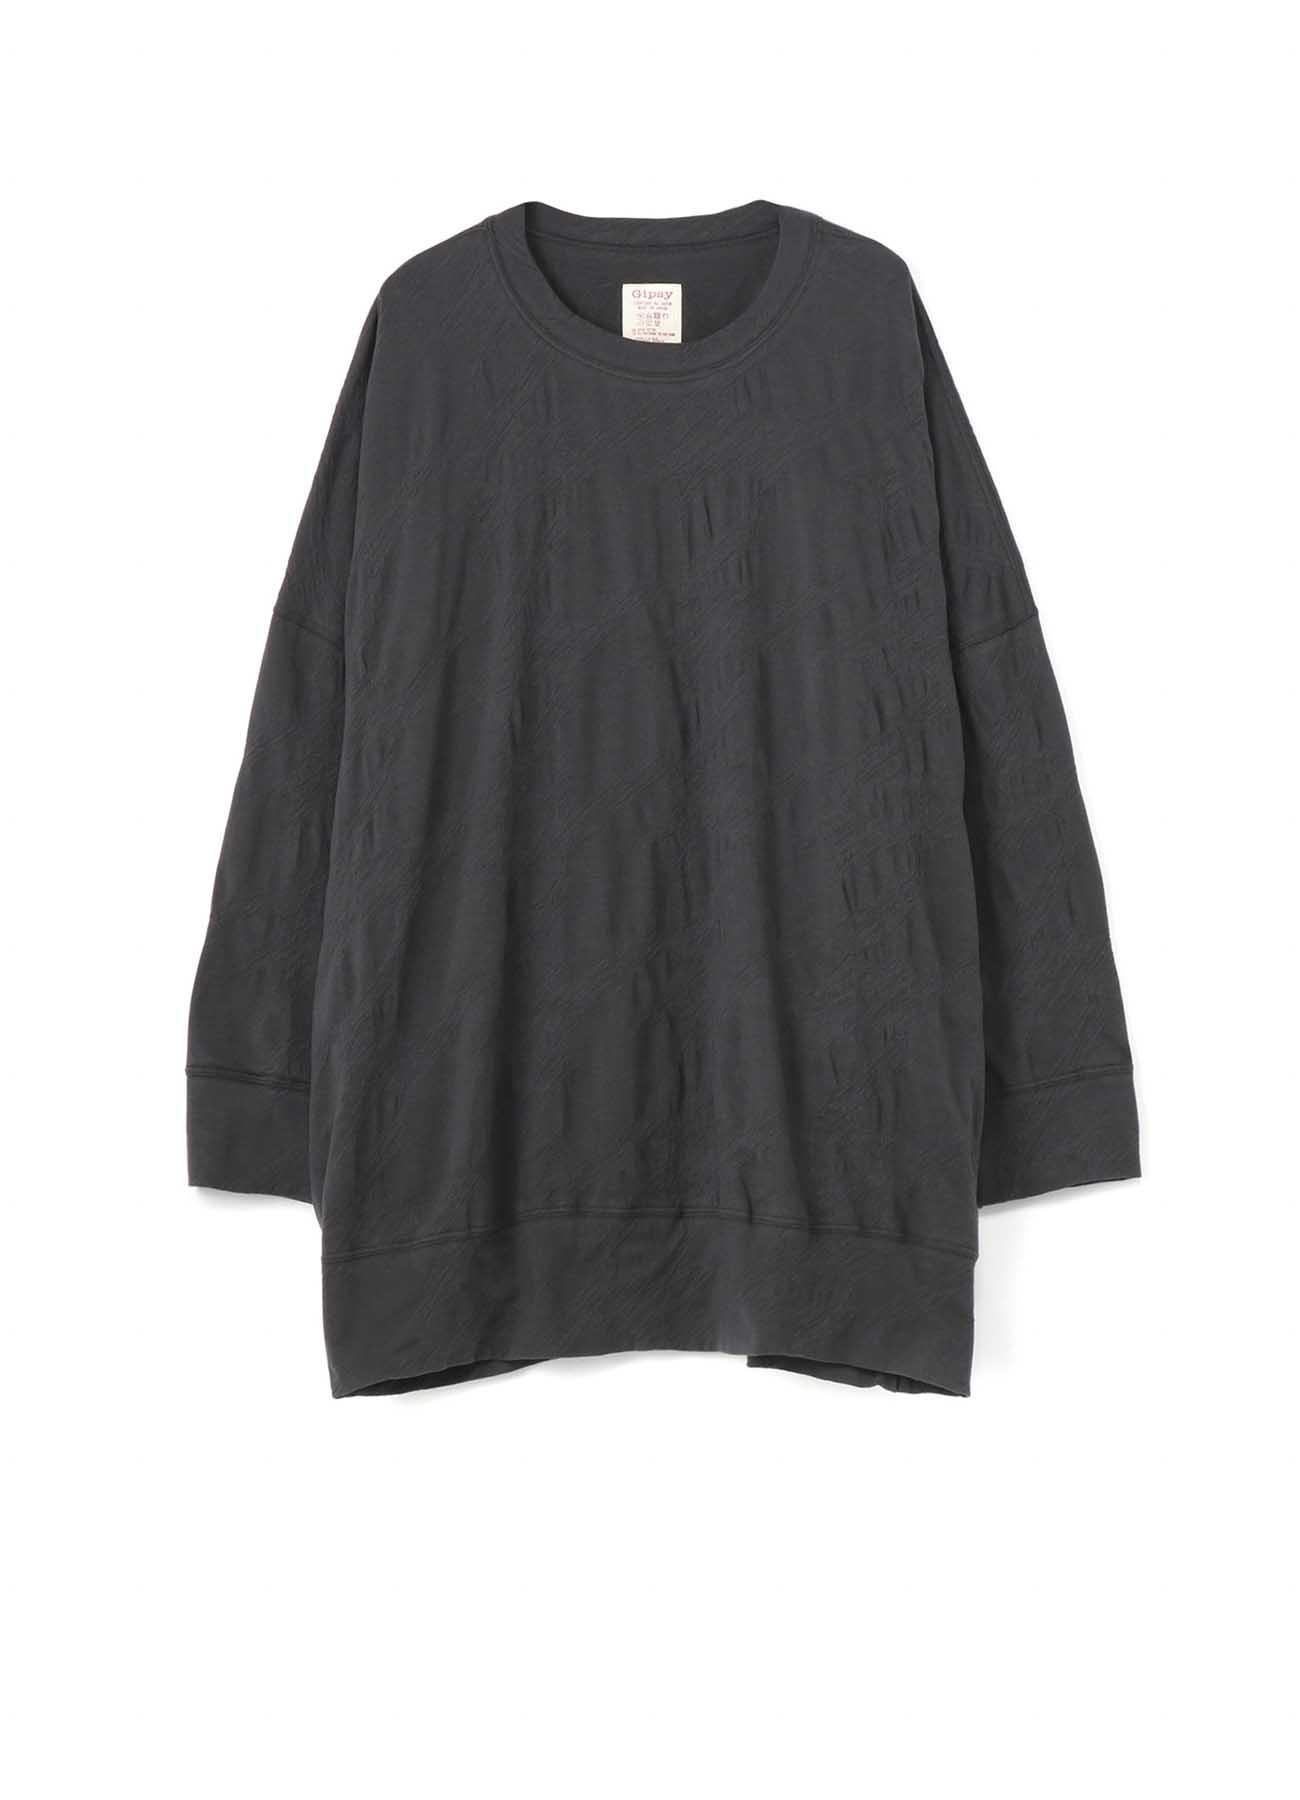 Gipsy 立体褶皱宽松长款T恤